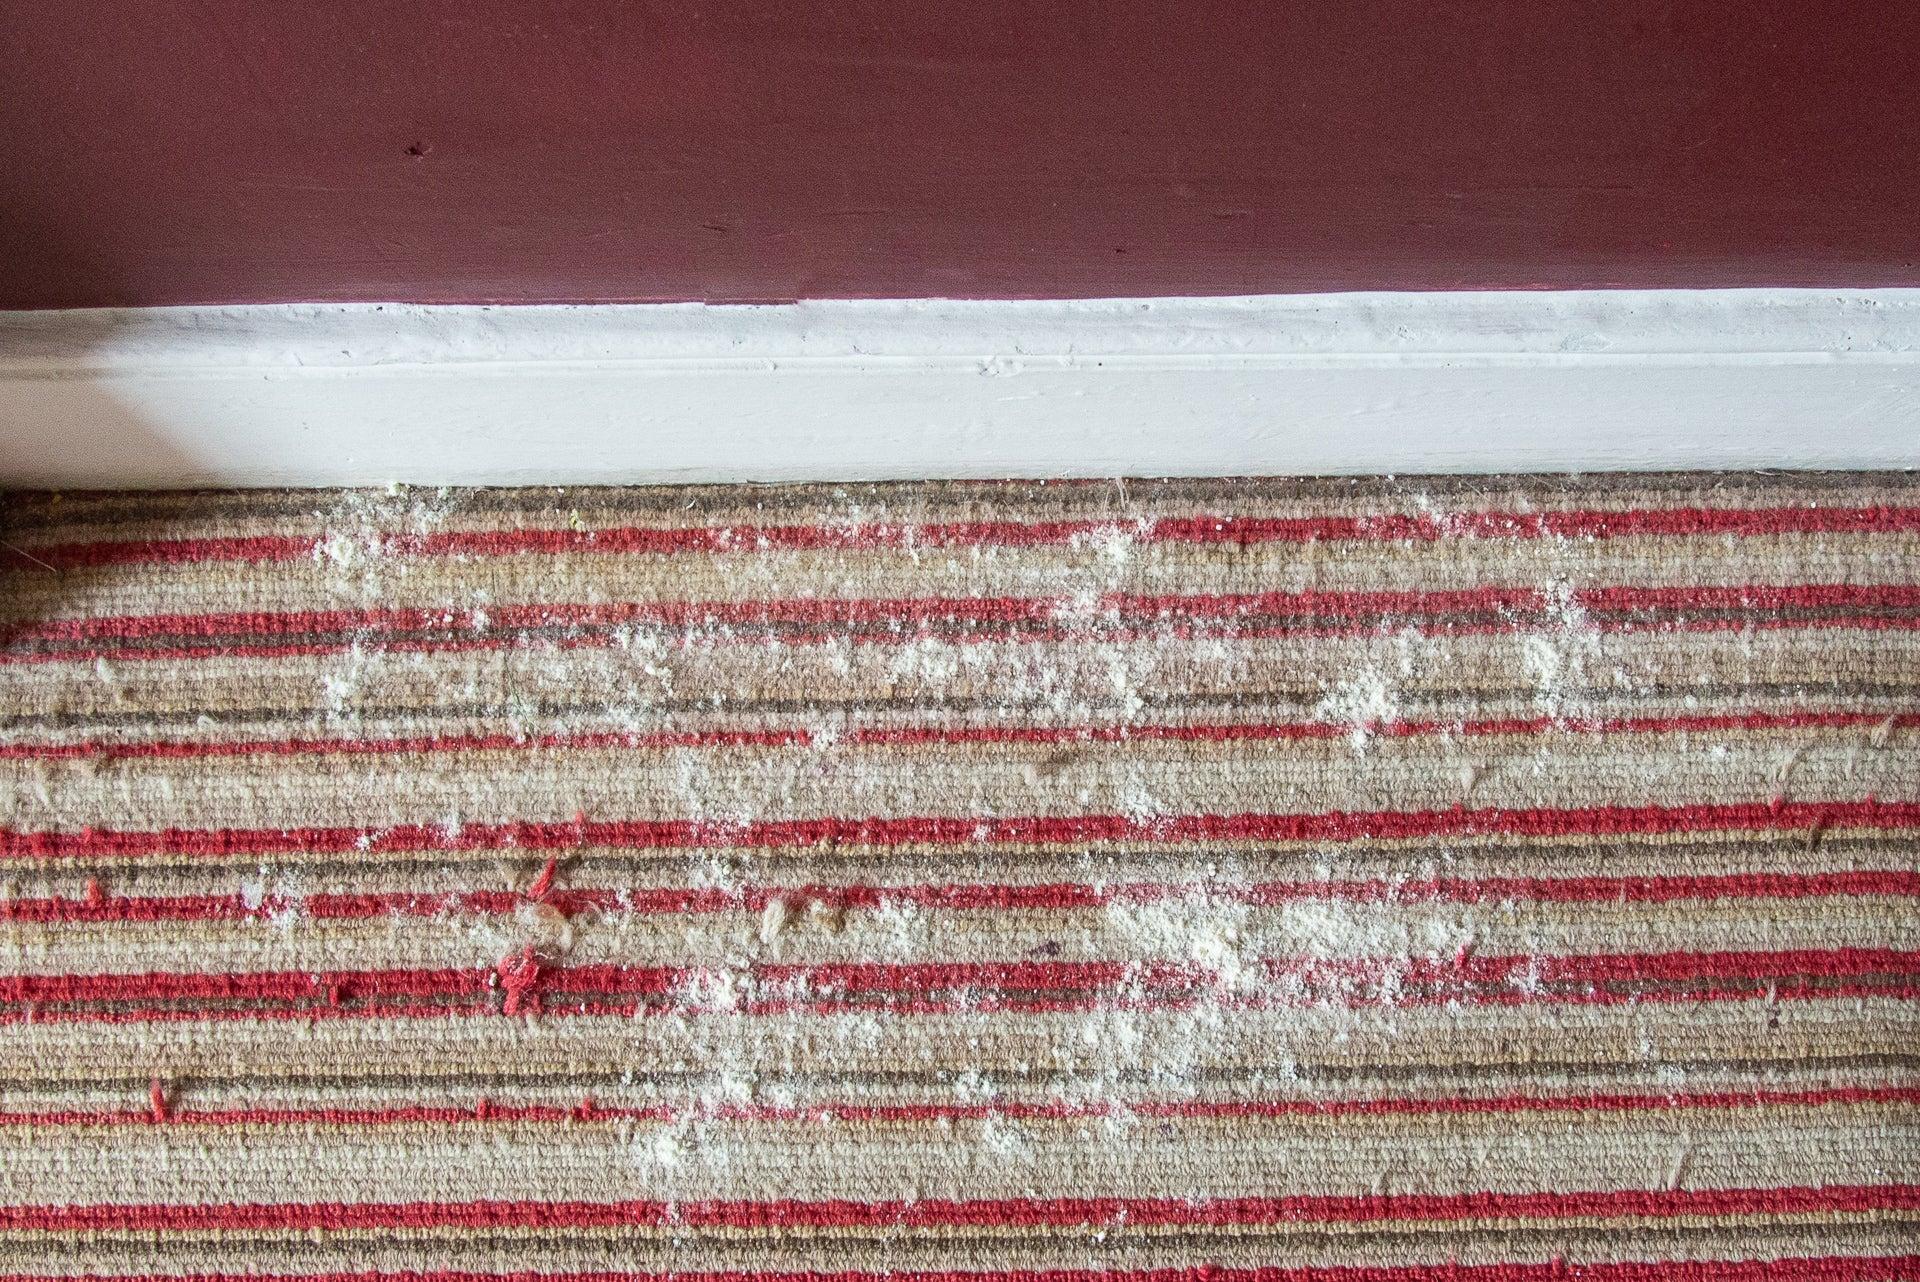 Vorwerk Kobold VB100 carpet dirty